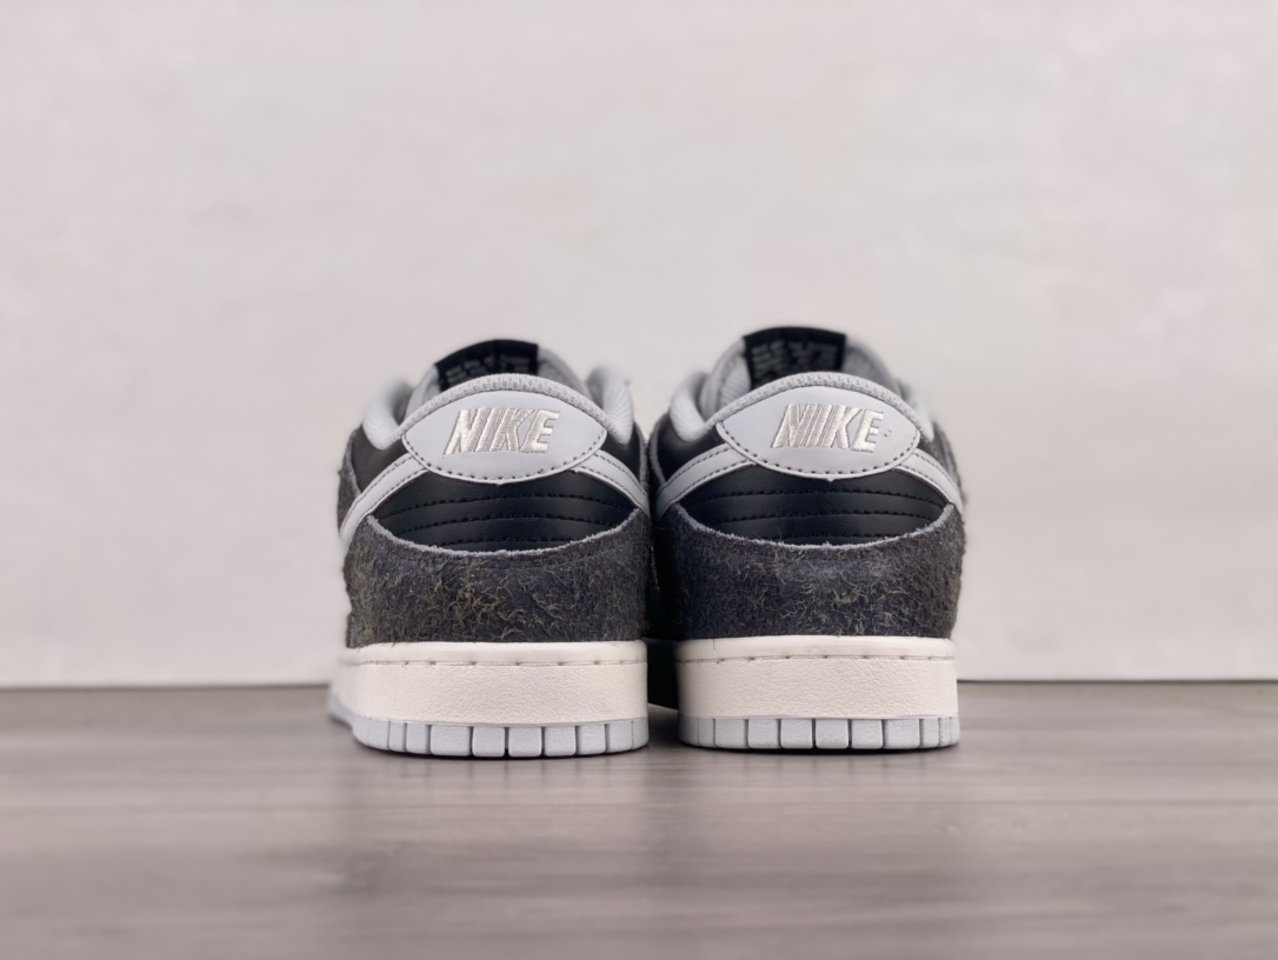 2021 New Nike Dunk Low Retro Animal Pack Zebra DH7913-001 Back heel